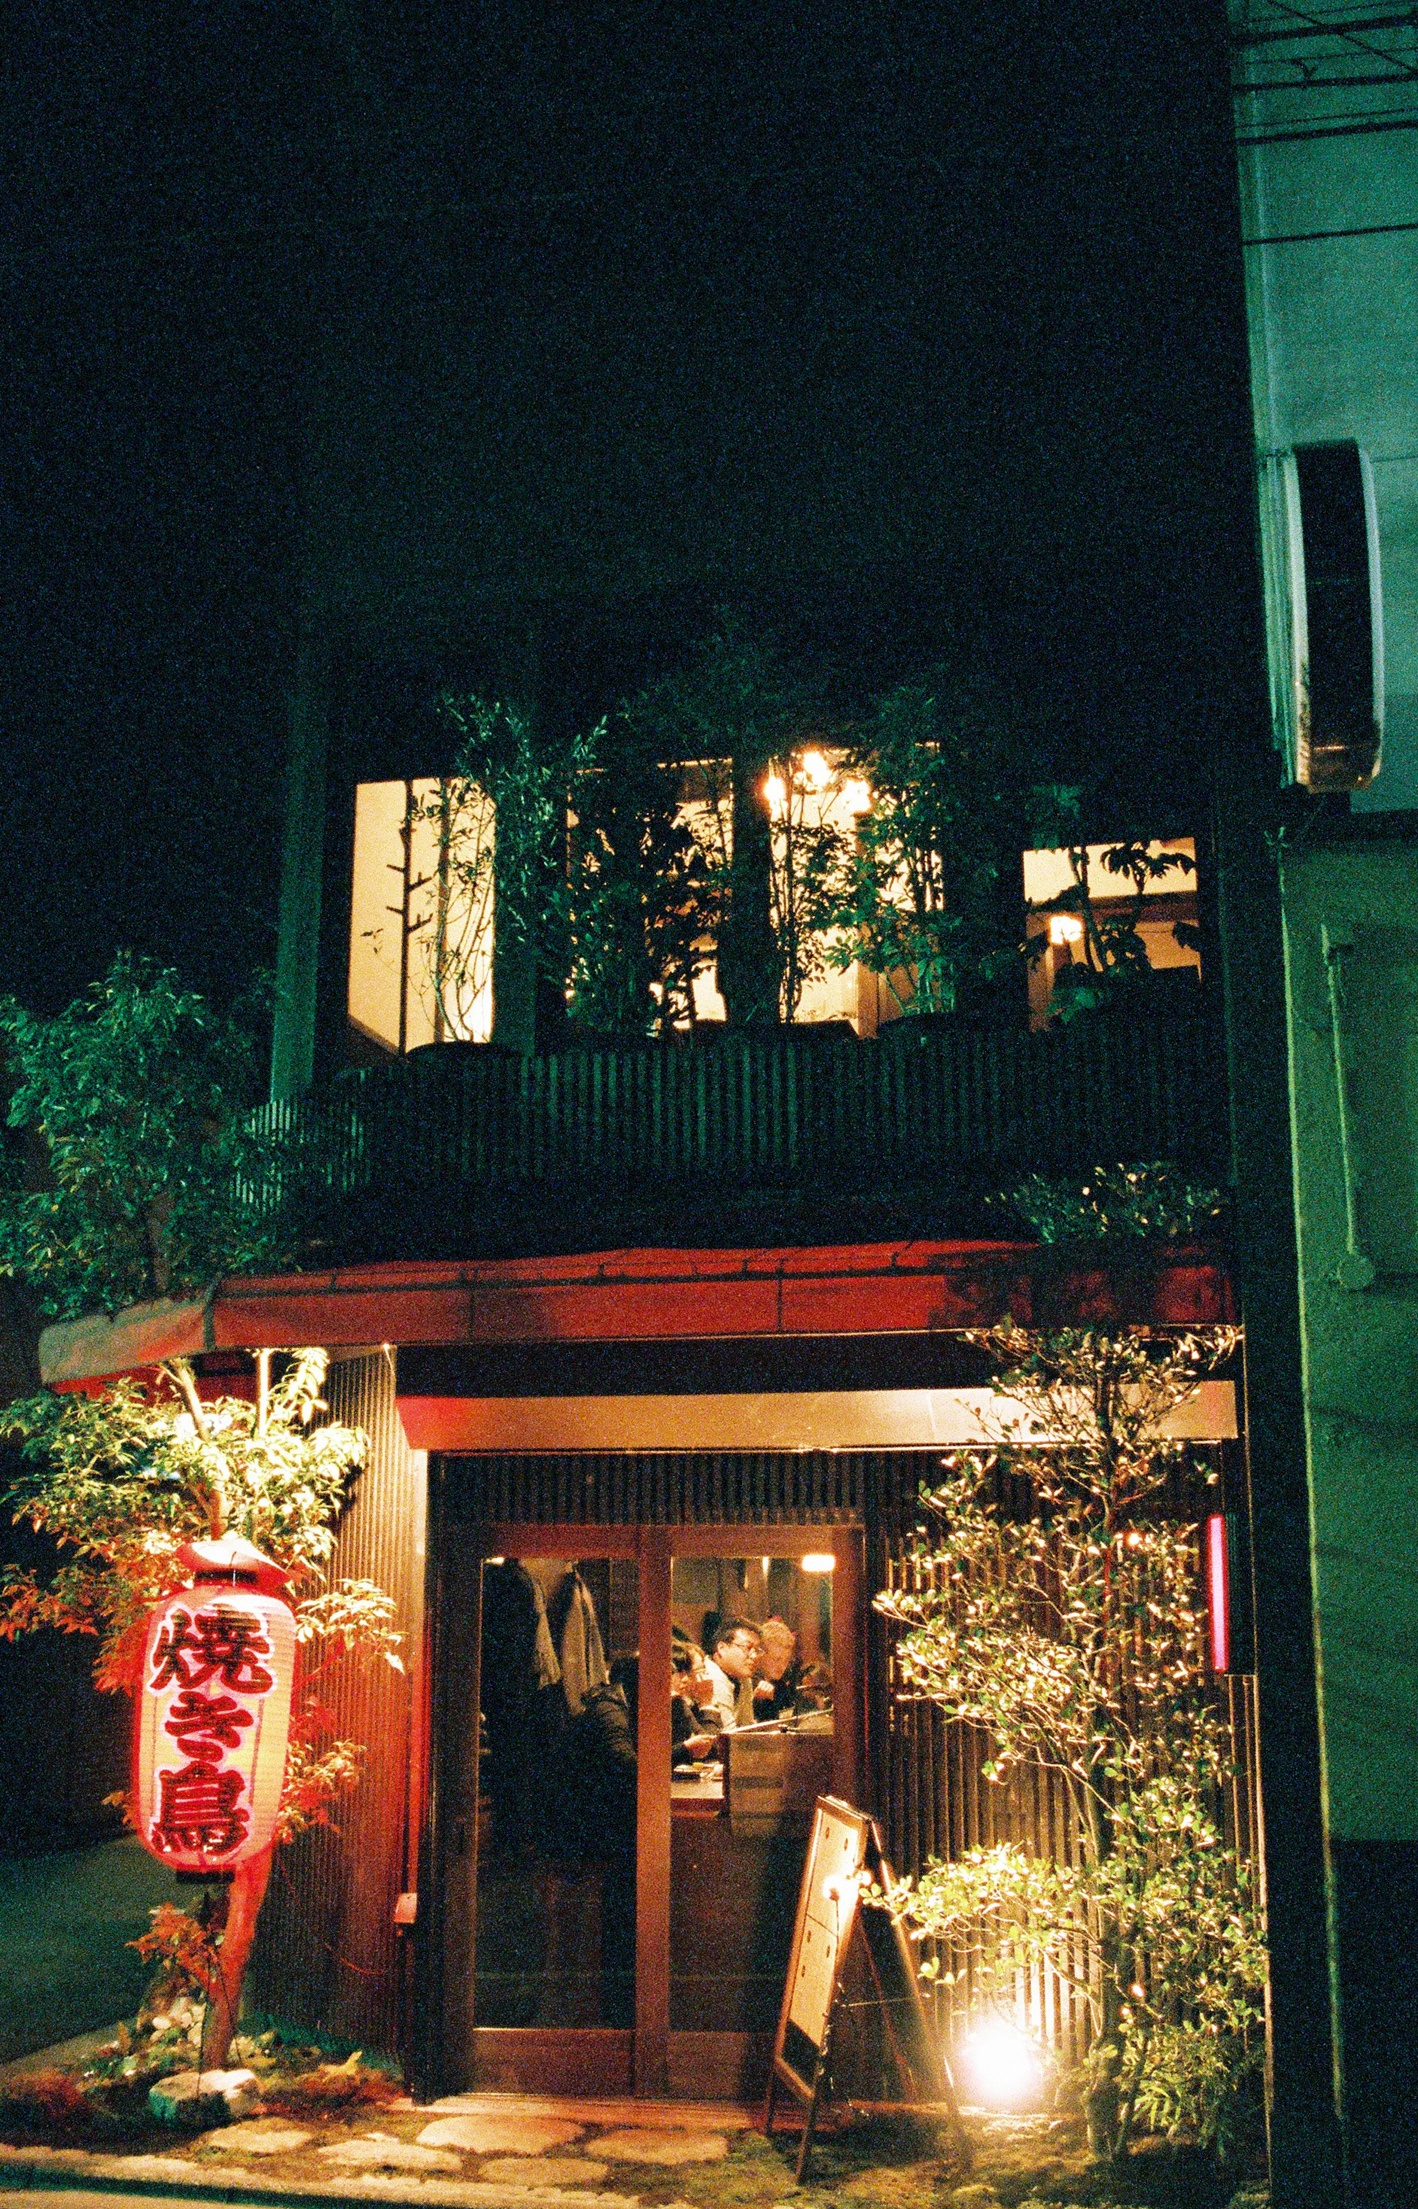 025-kyoto-arashiyama-sophie-baker-photography